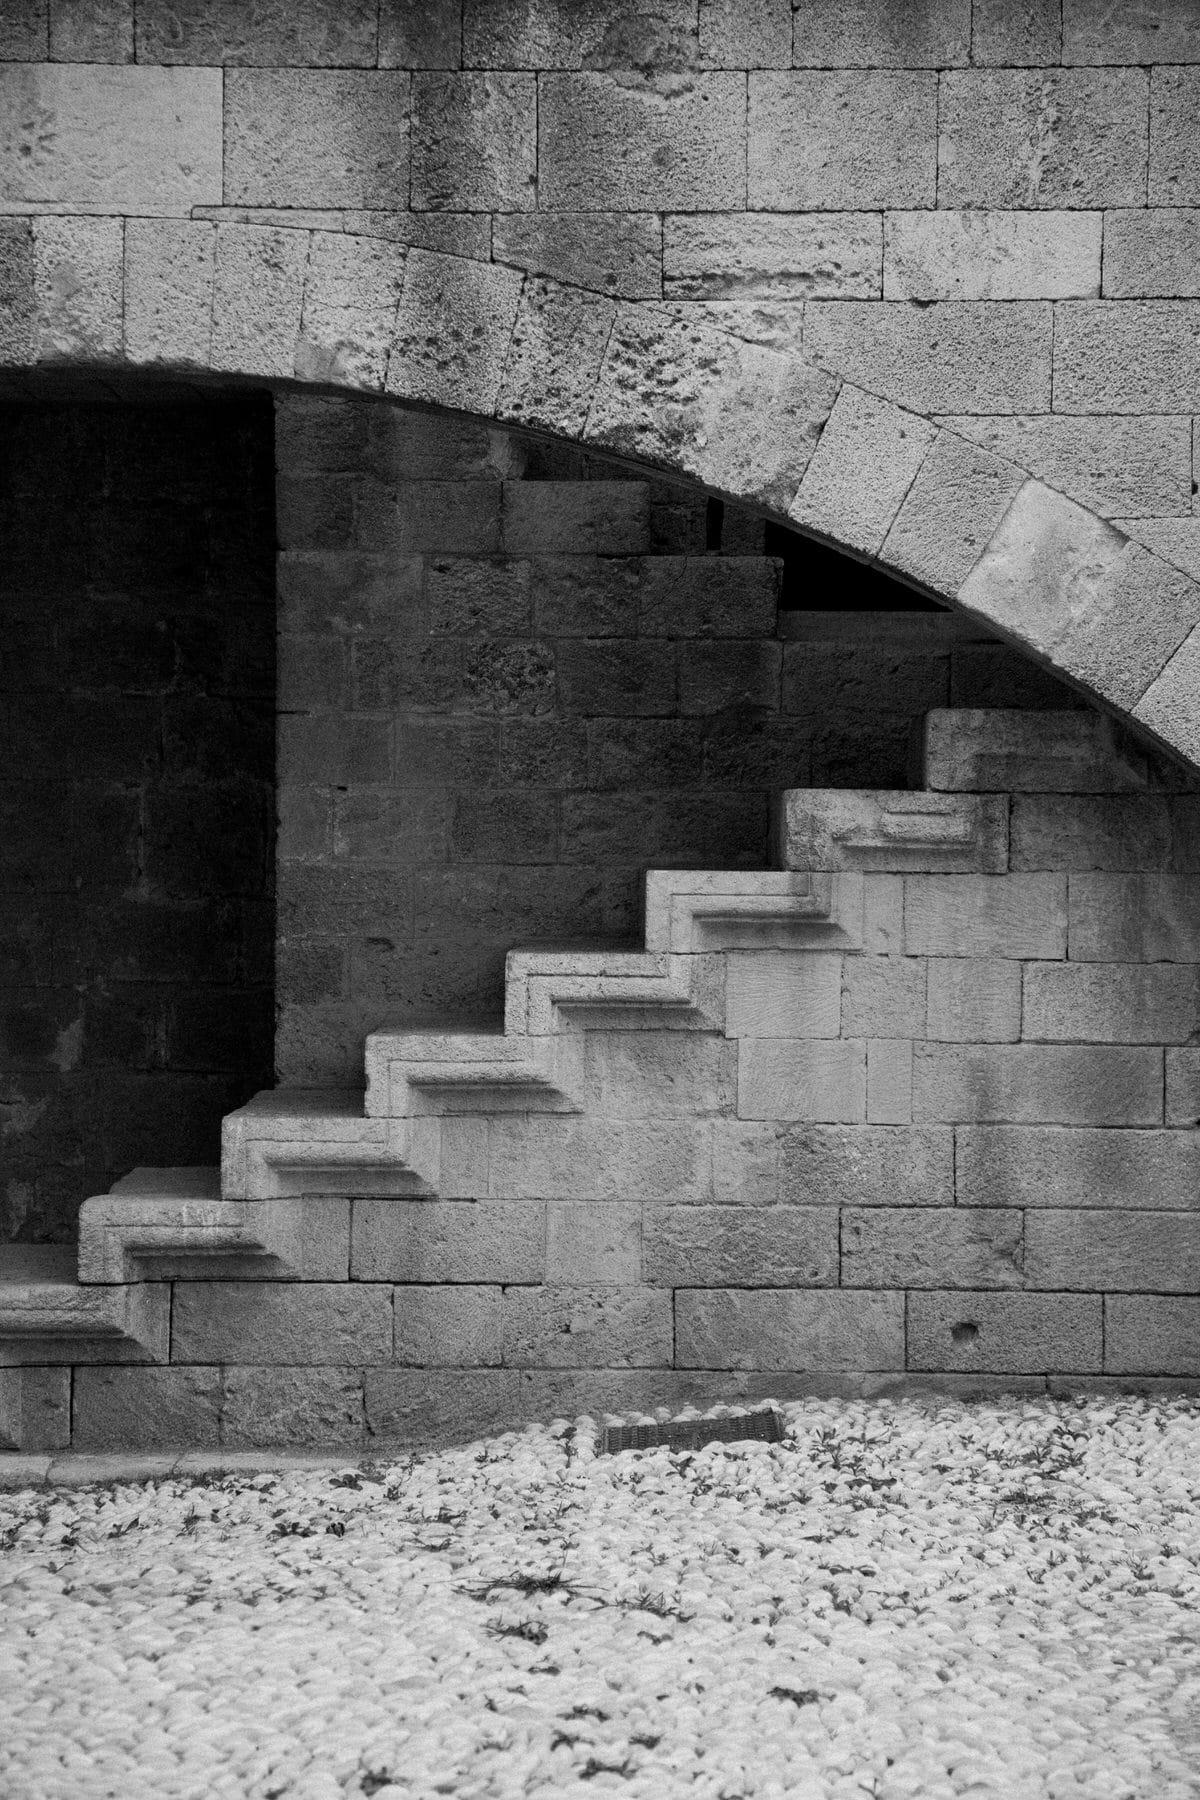 Rhodes-Greece-Island-black-and-white-fine-art-photography-by-Studio-L-photographer-Laura-Schneider-_2746